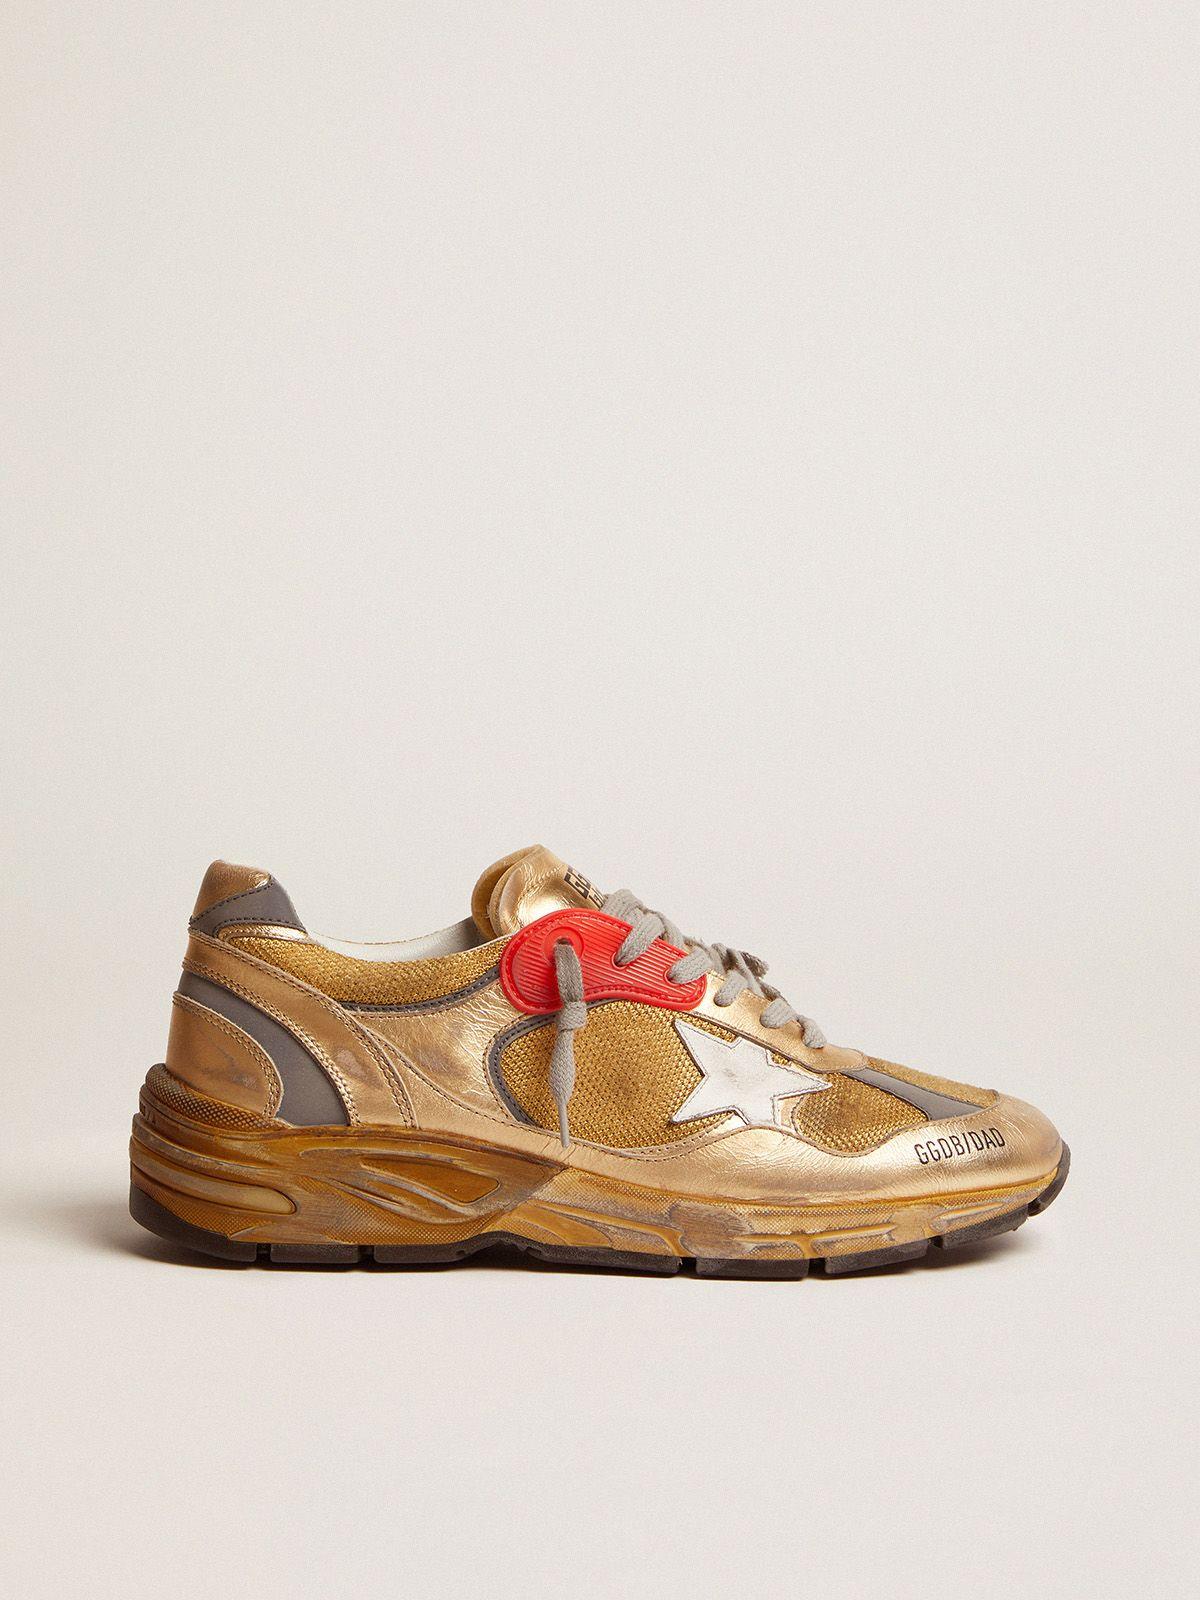 Men's gold Dad-Star sneakers